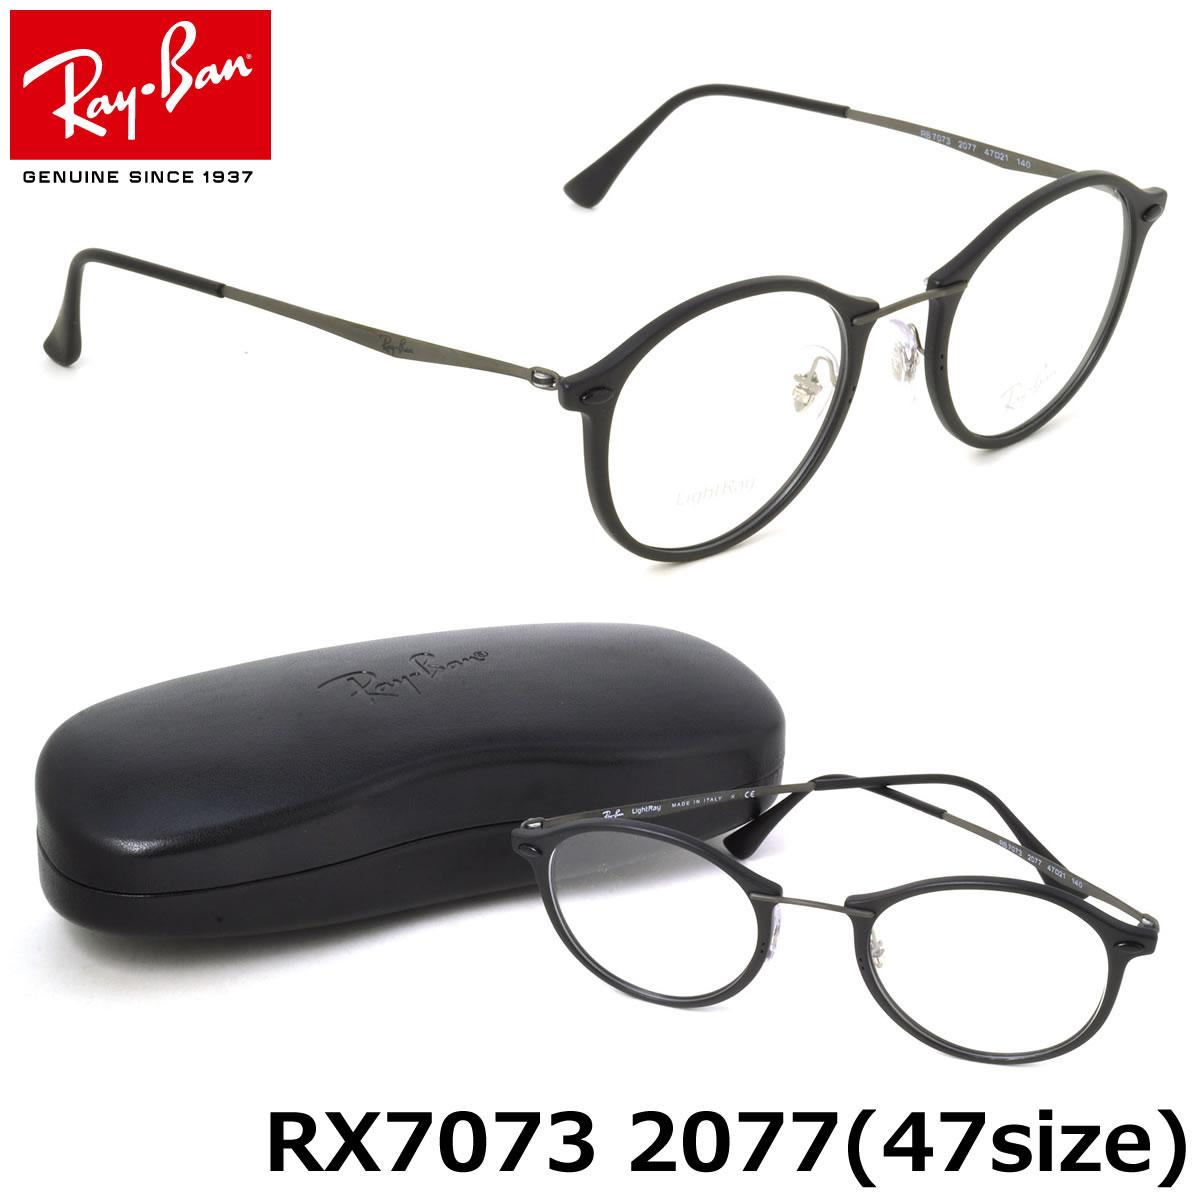 32930bd70f (Ray-Ban) tech light Ray glasses frames RX7073 2077 47 size round round  glasses ROUND Ray-Ban RAYBAN TECH ROUND LIGHT RAY men s women s